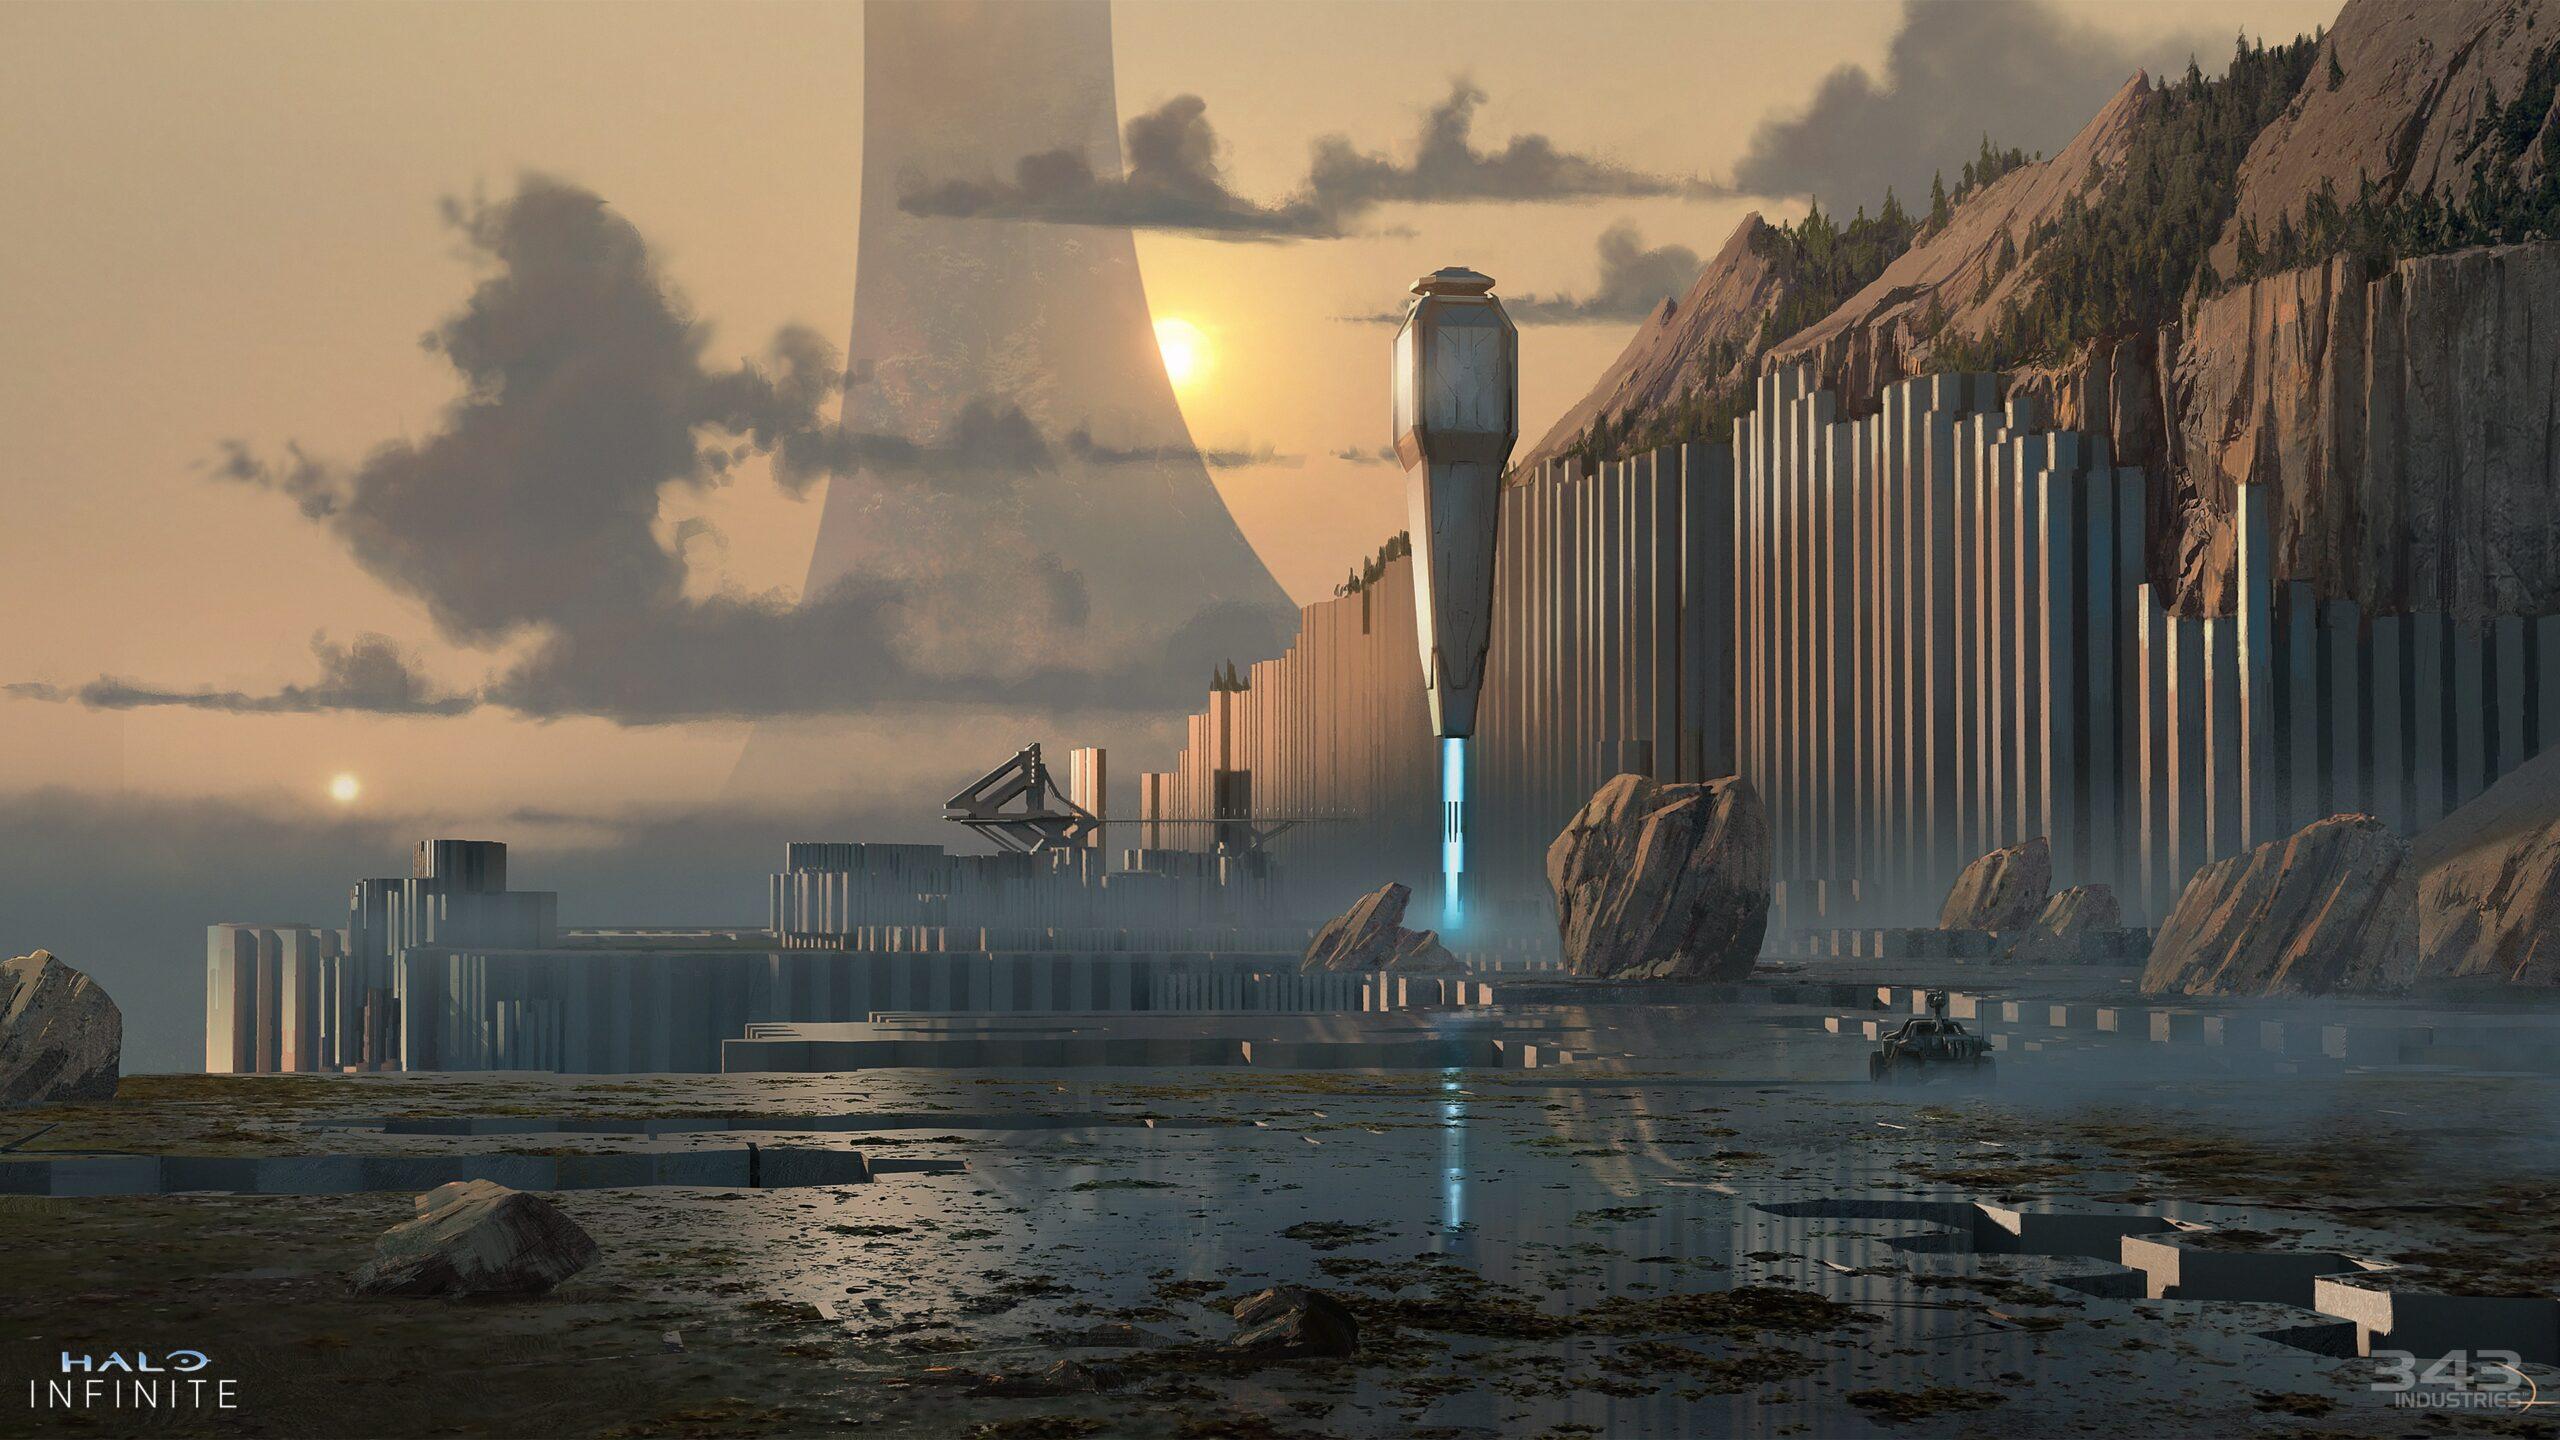 Halo Infinite : Halo Infinite Receives New Screenshots & Fall 2021 Release ...